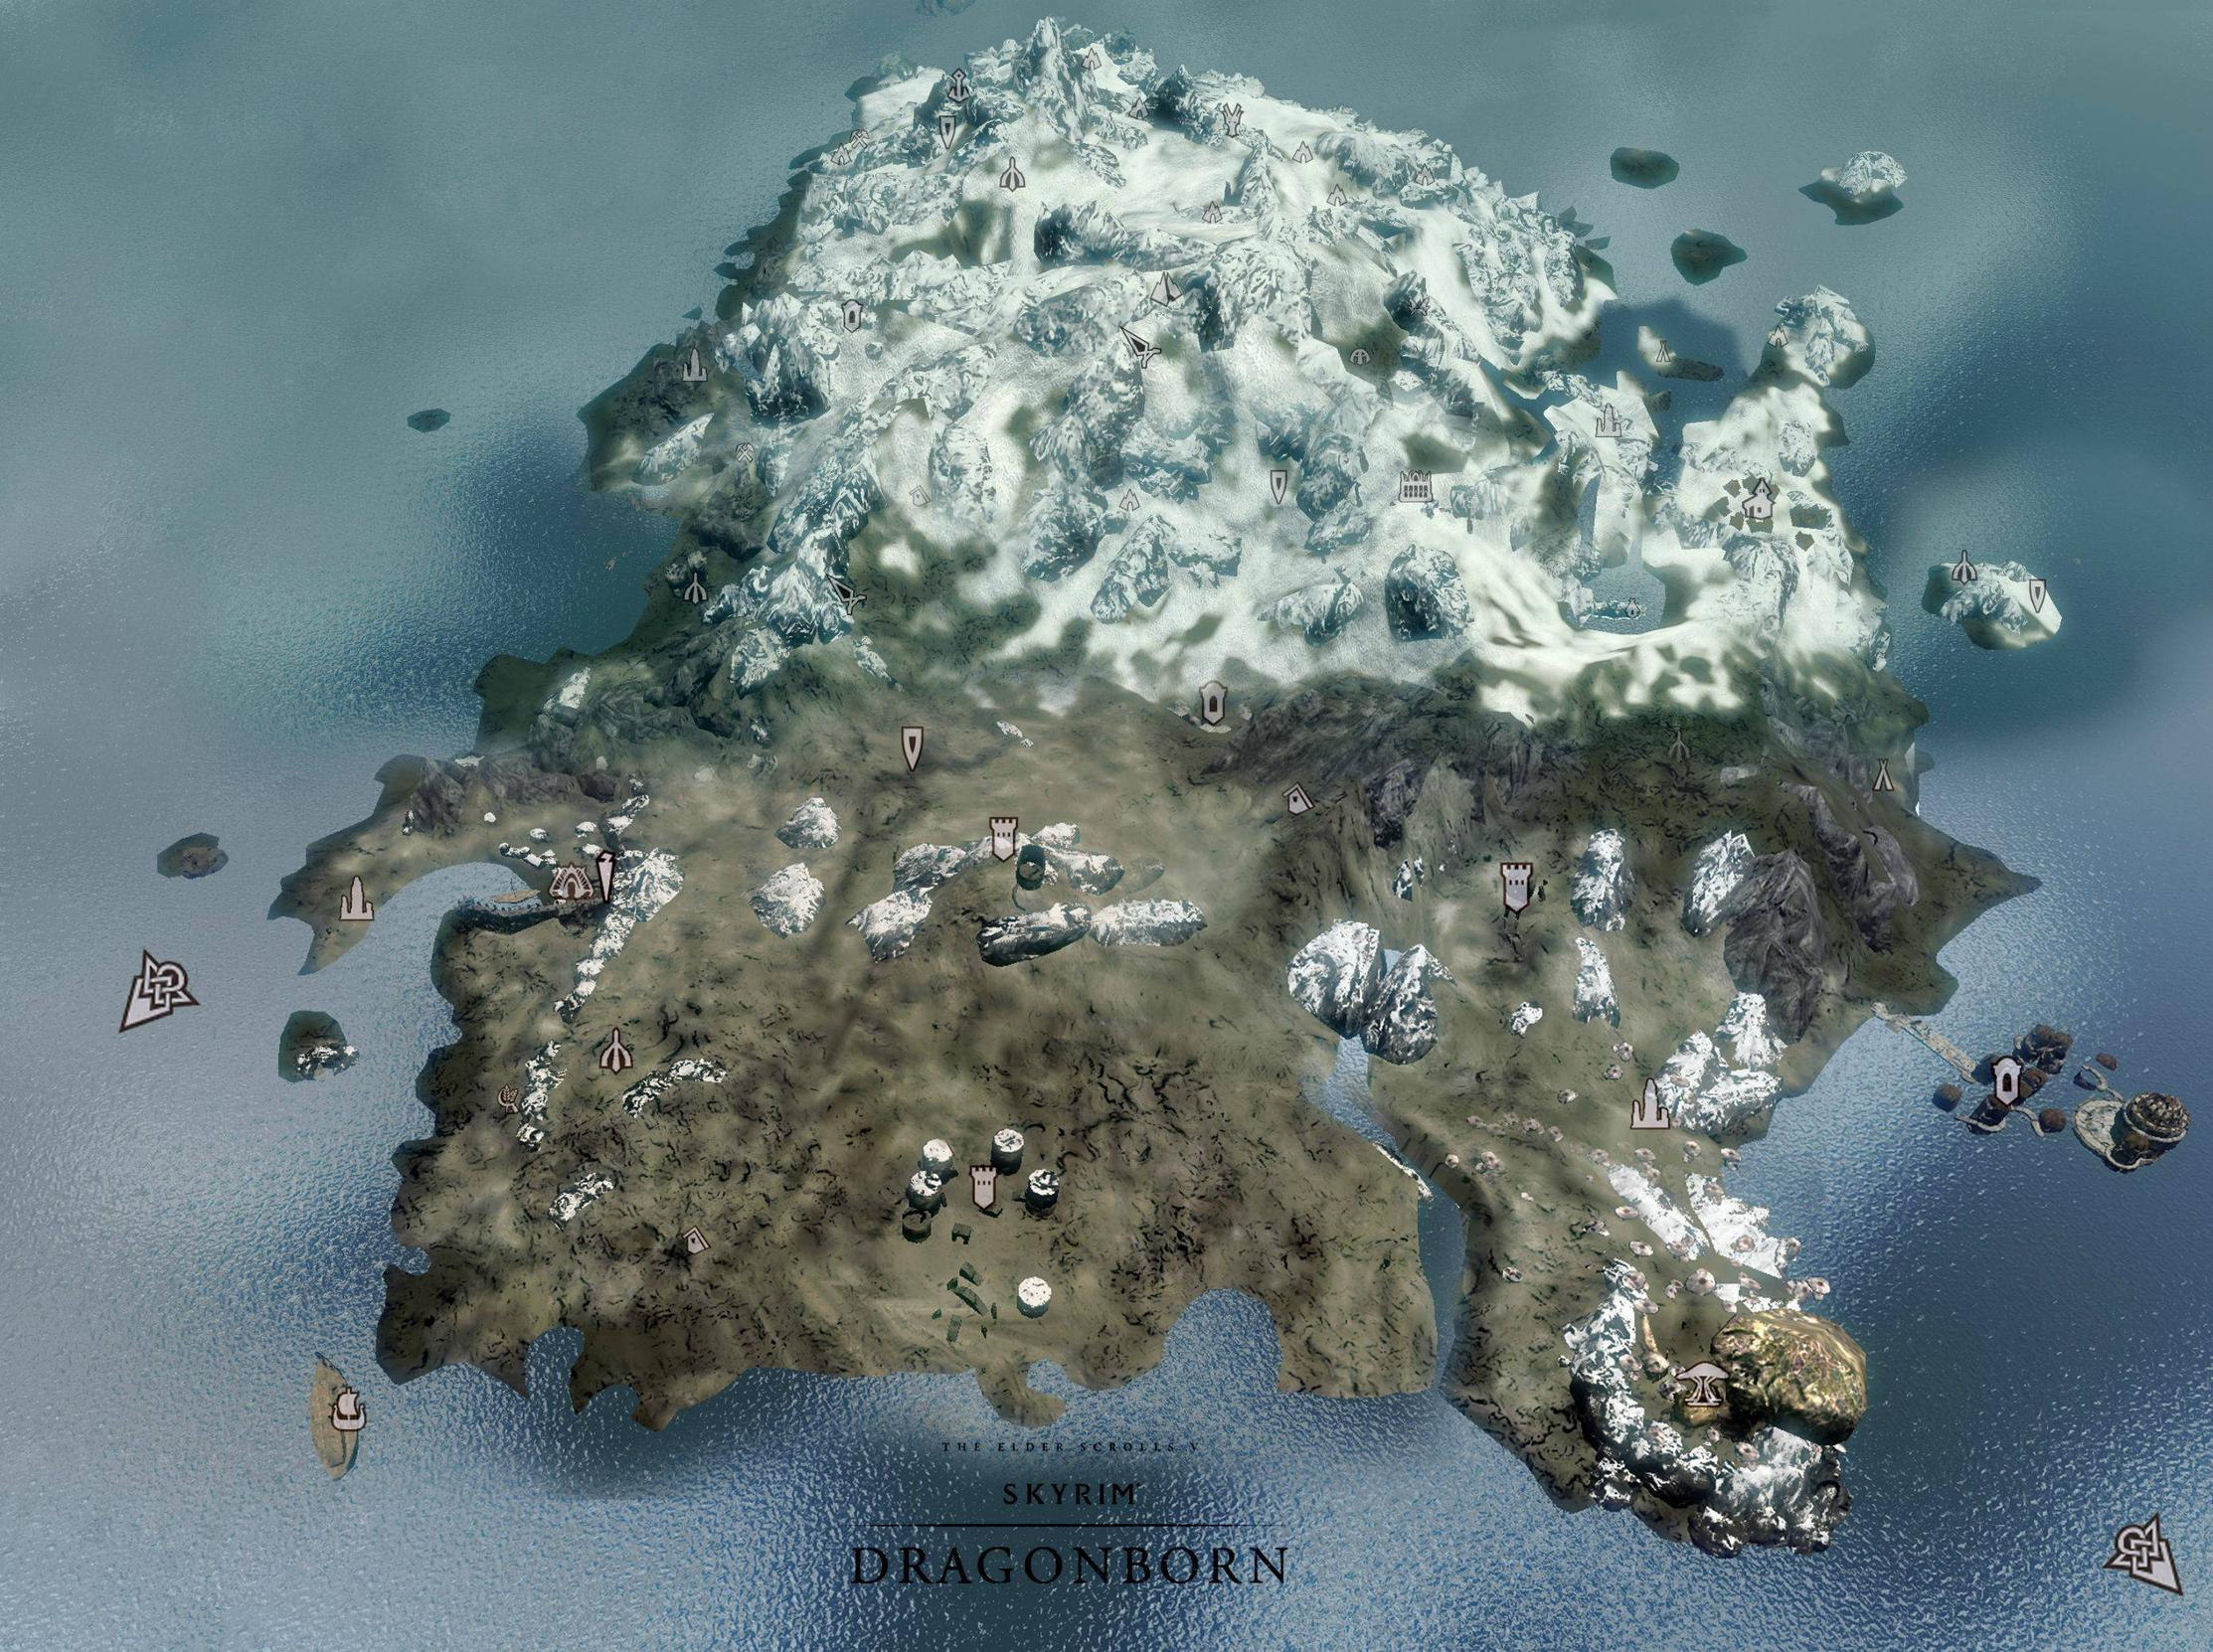 Solstheim (Dragonborn) | Elder Scrolls | FANDOM powered by Wikia